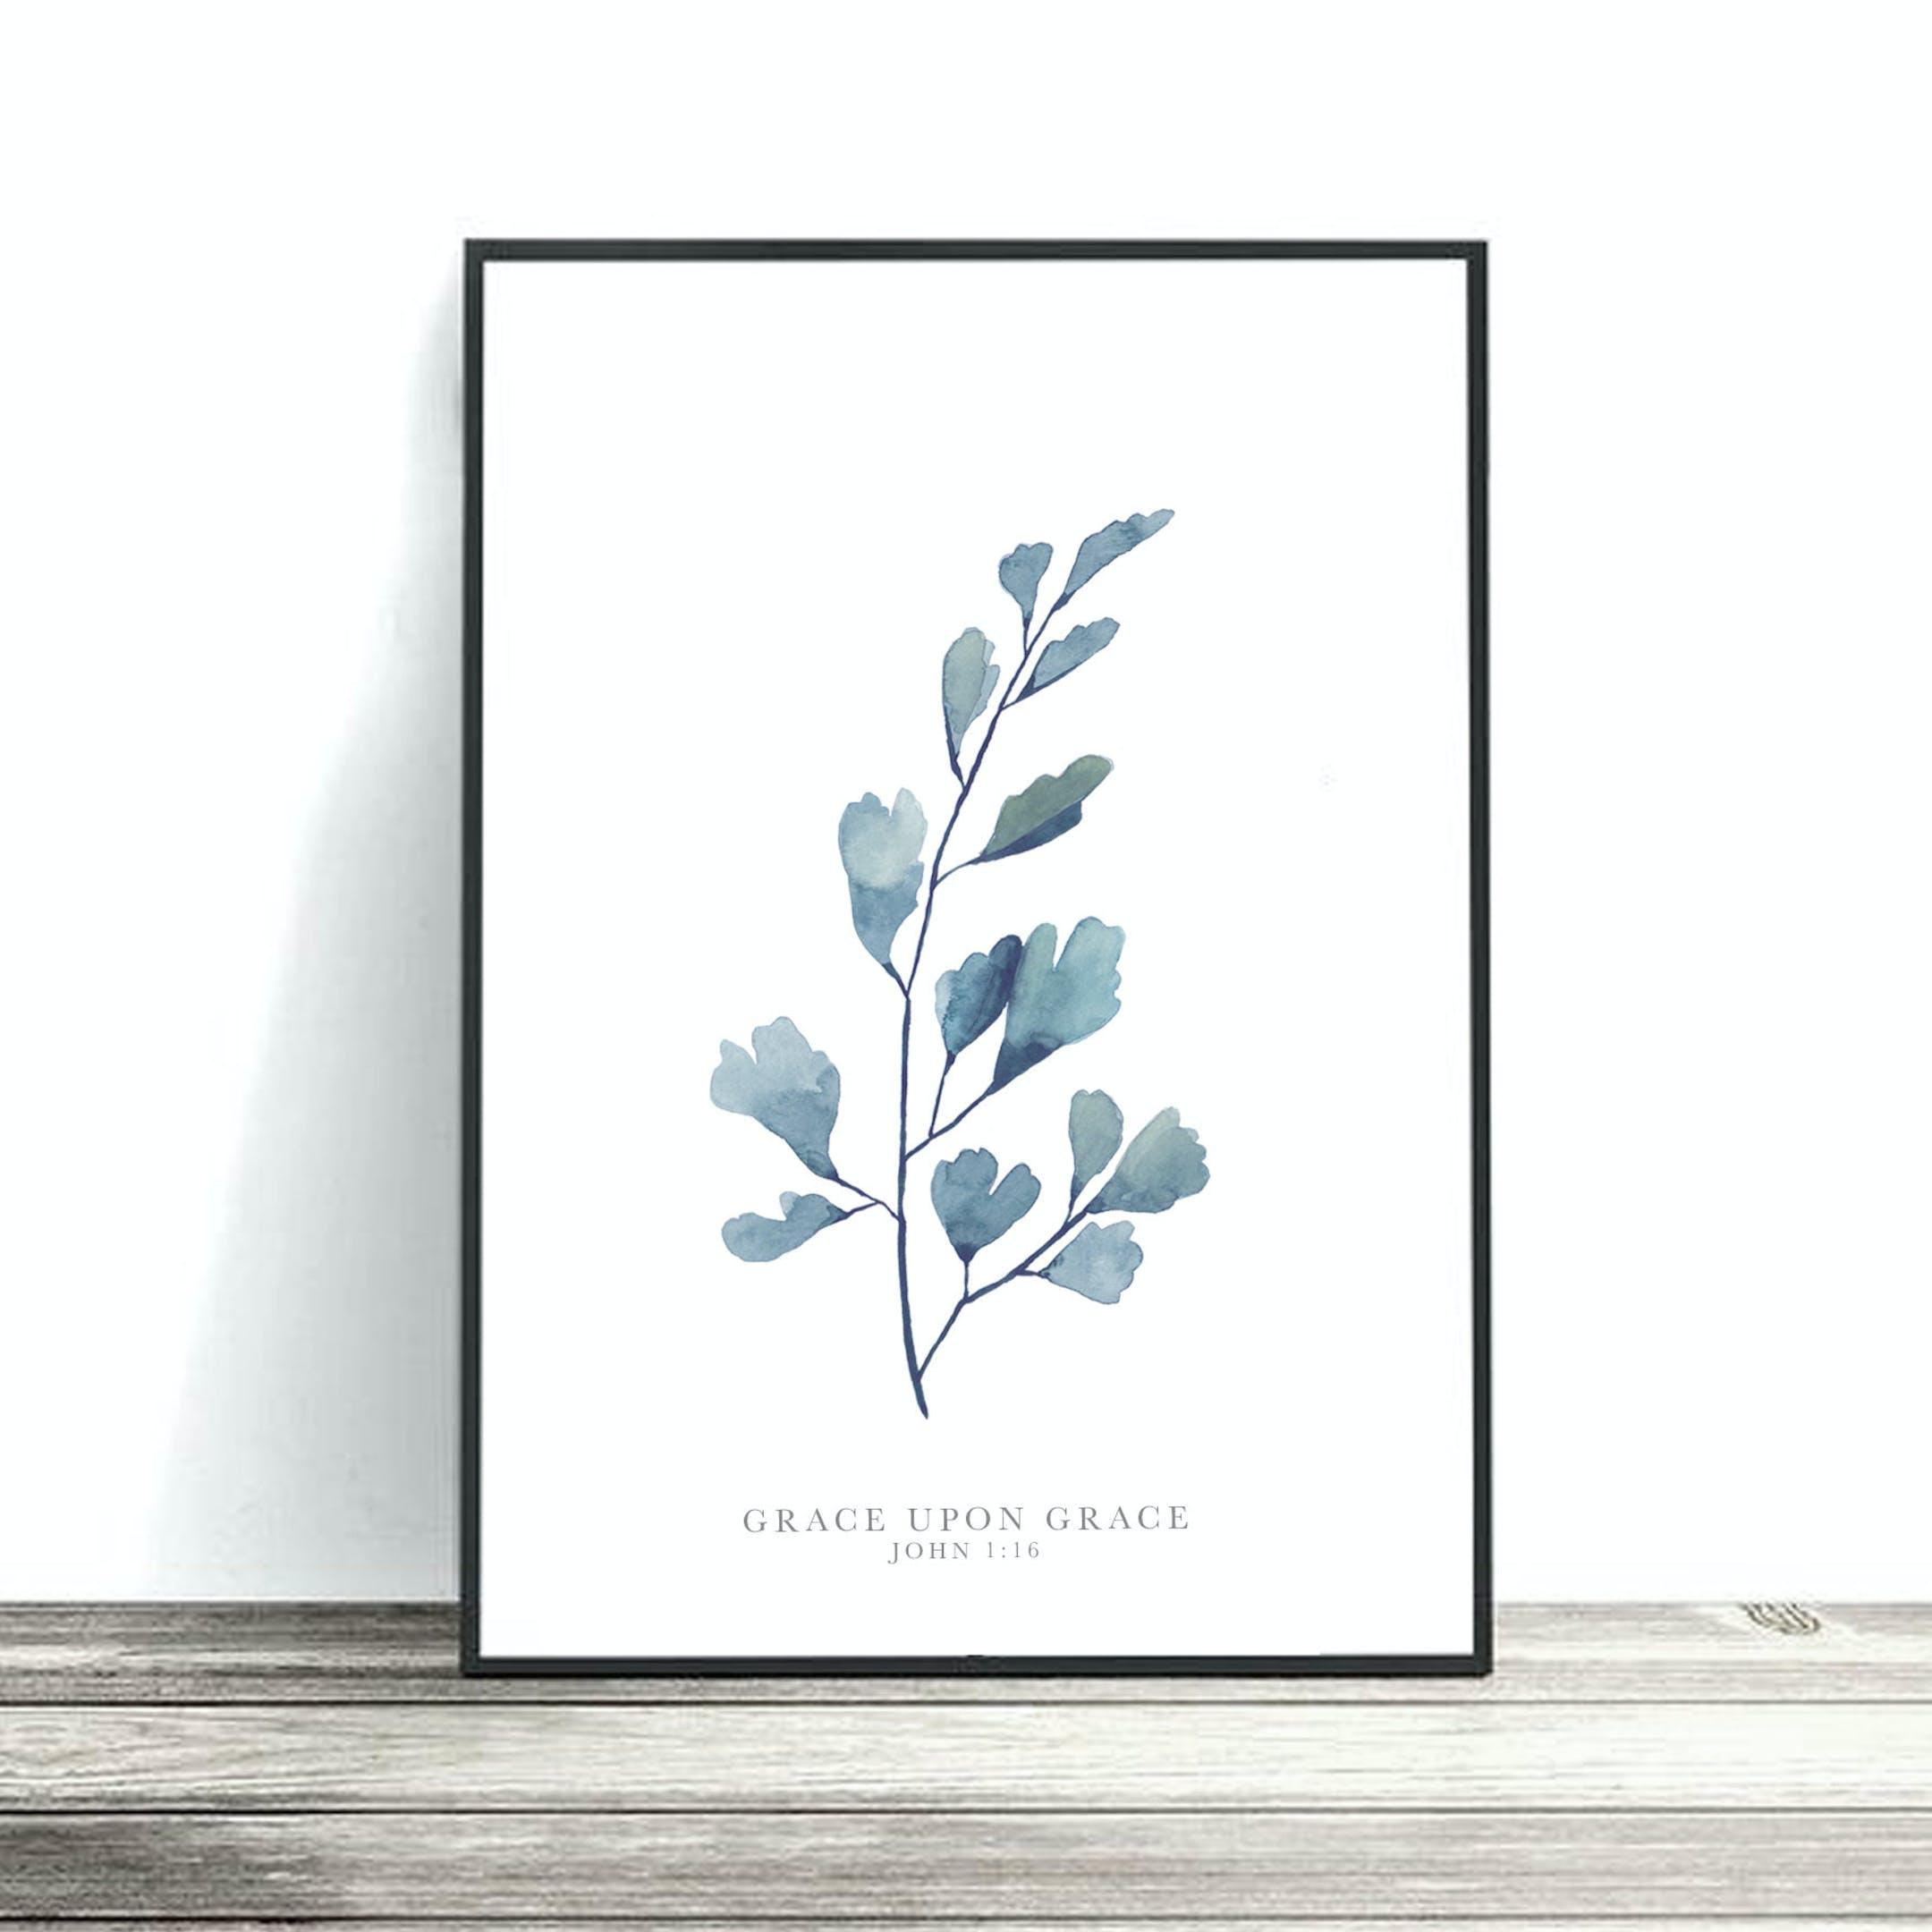 Blue Maidenhead Print - John 1:16 - Christian Lettering Company